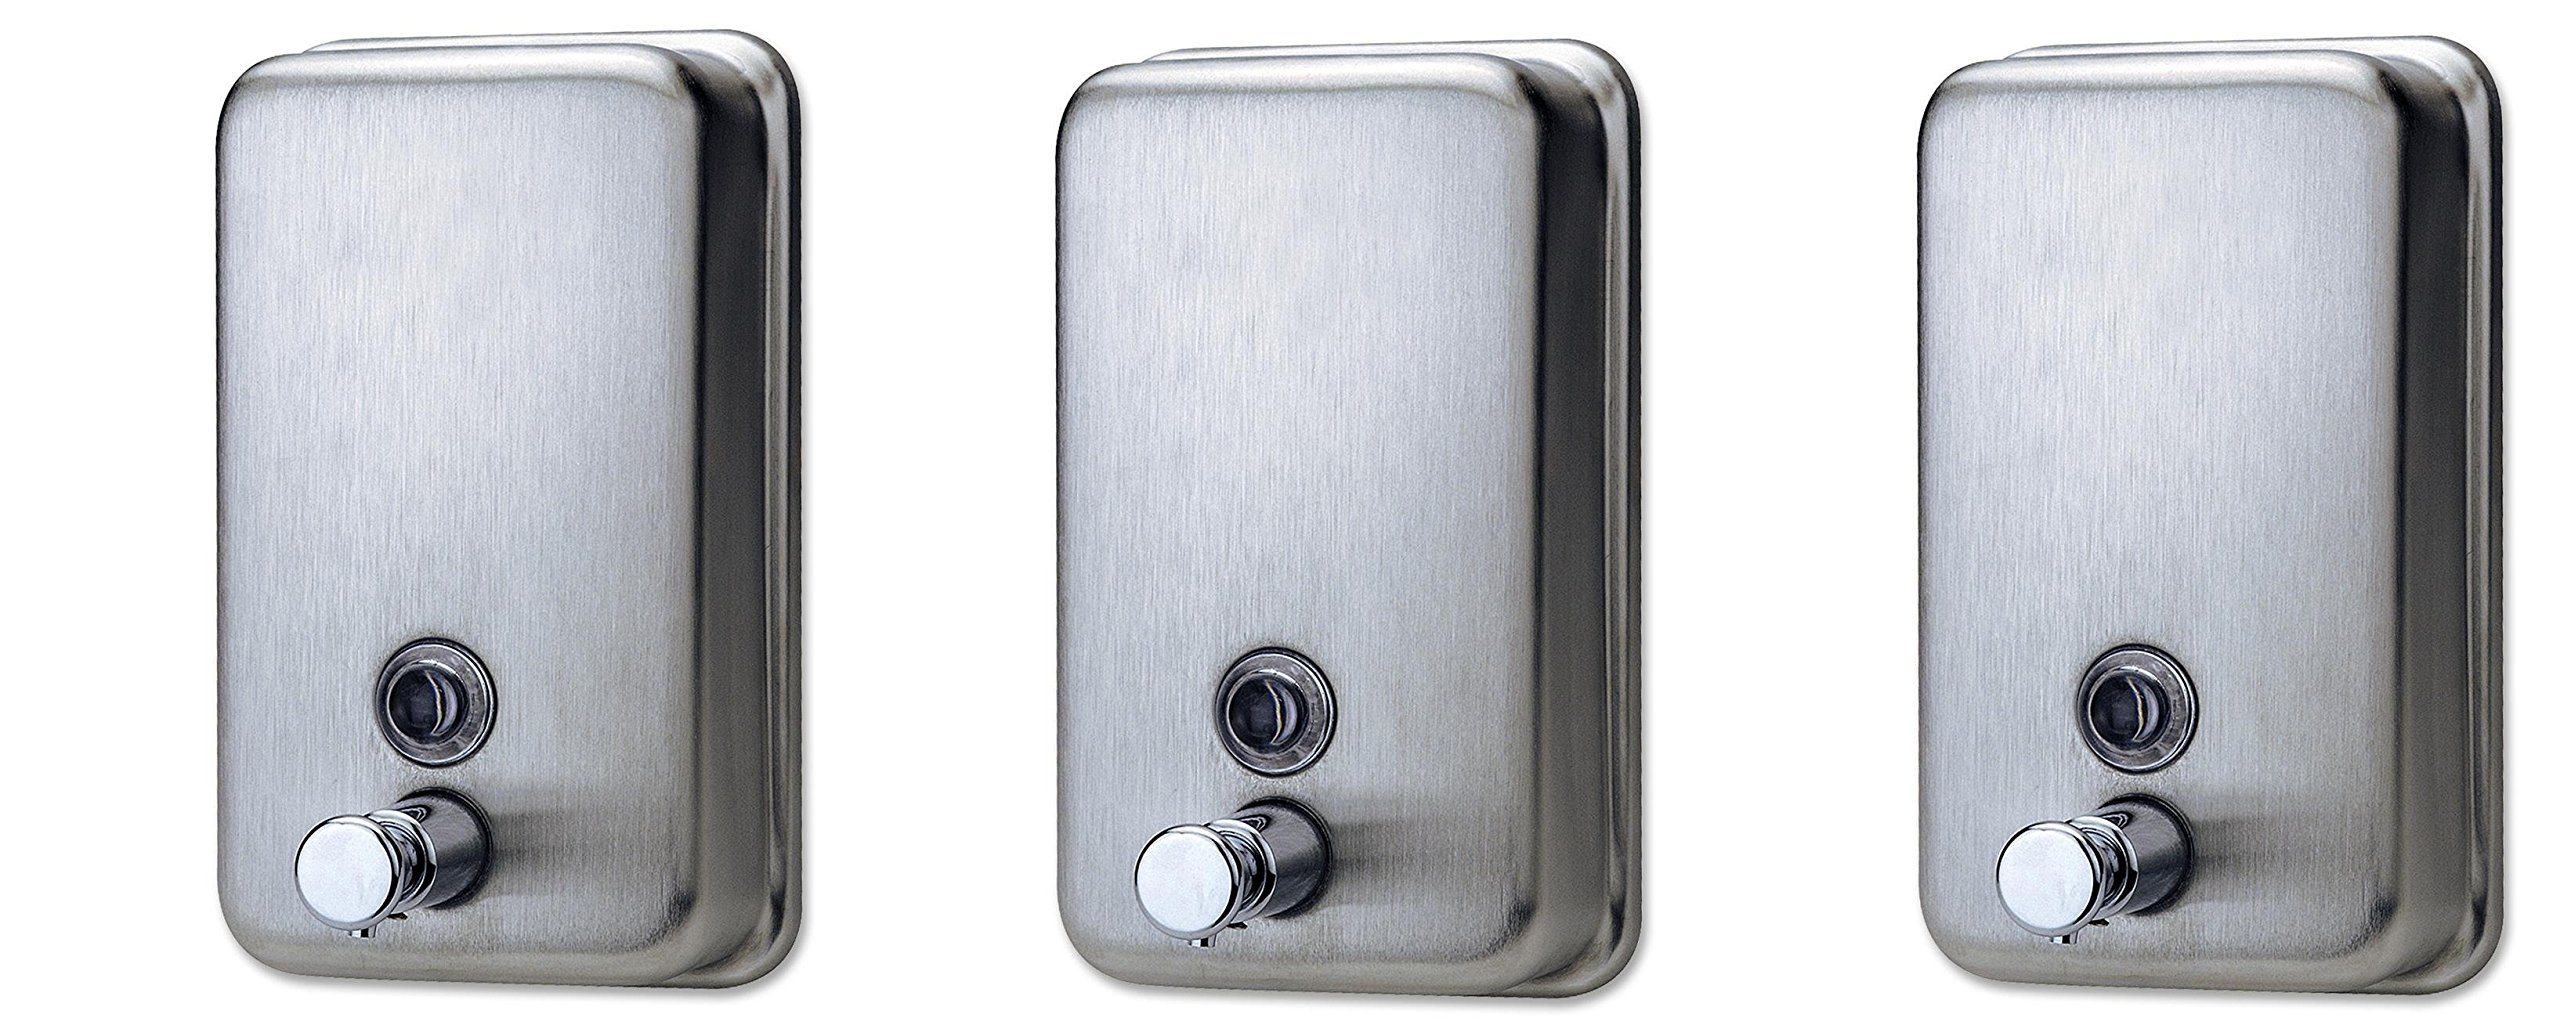 Genuine Joe GJO02201 Stainless Steel Manual Soap Dispenser, 31.5 fl oz Capacity (Pack of 3)